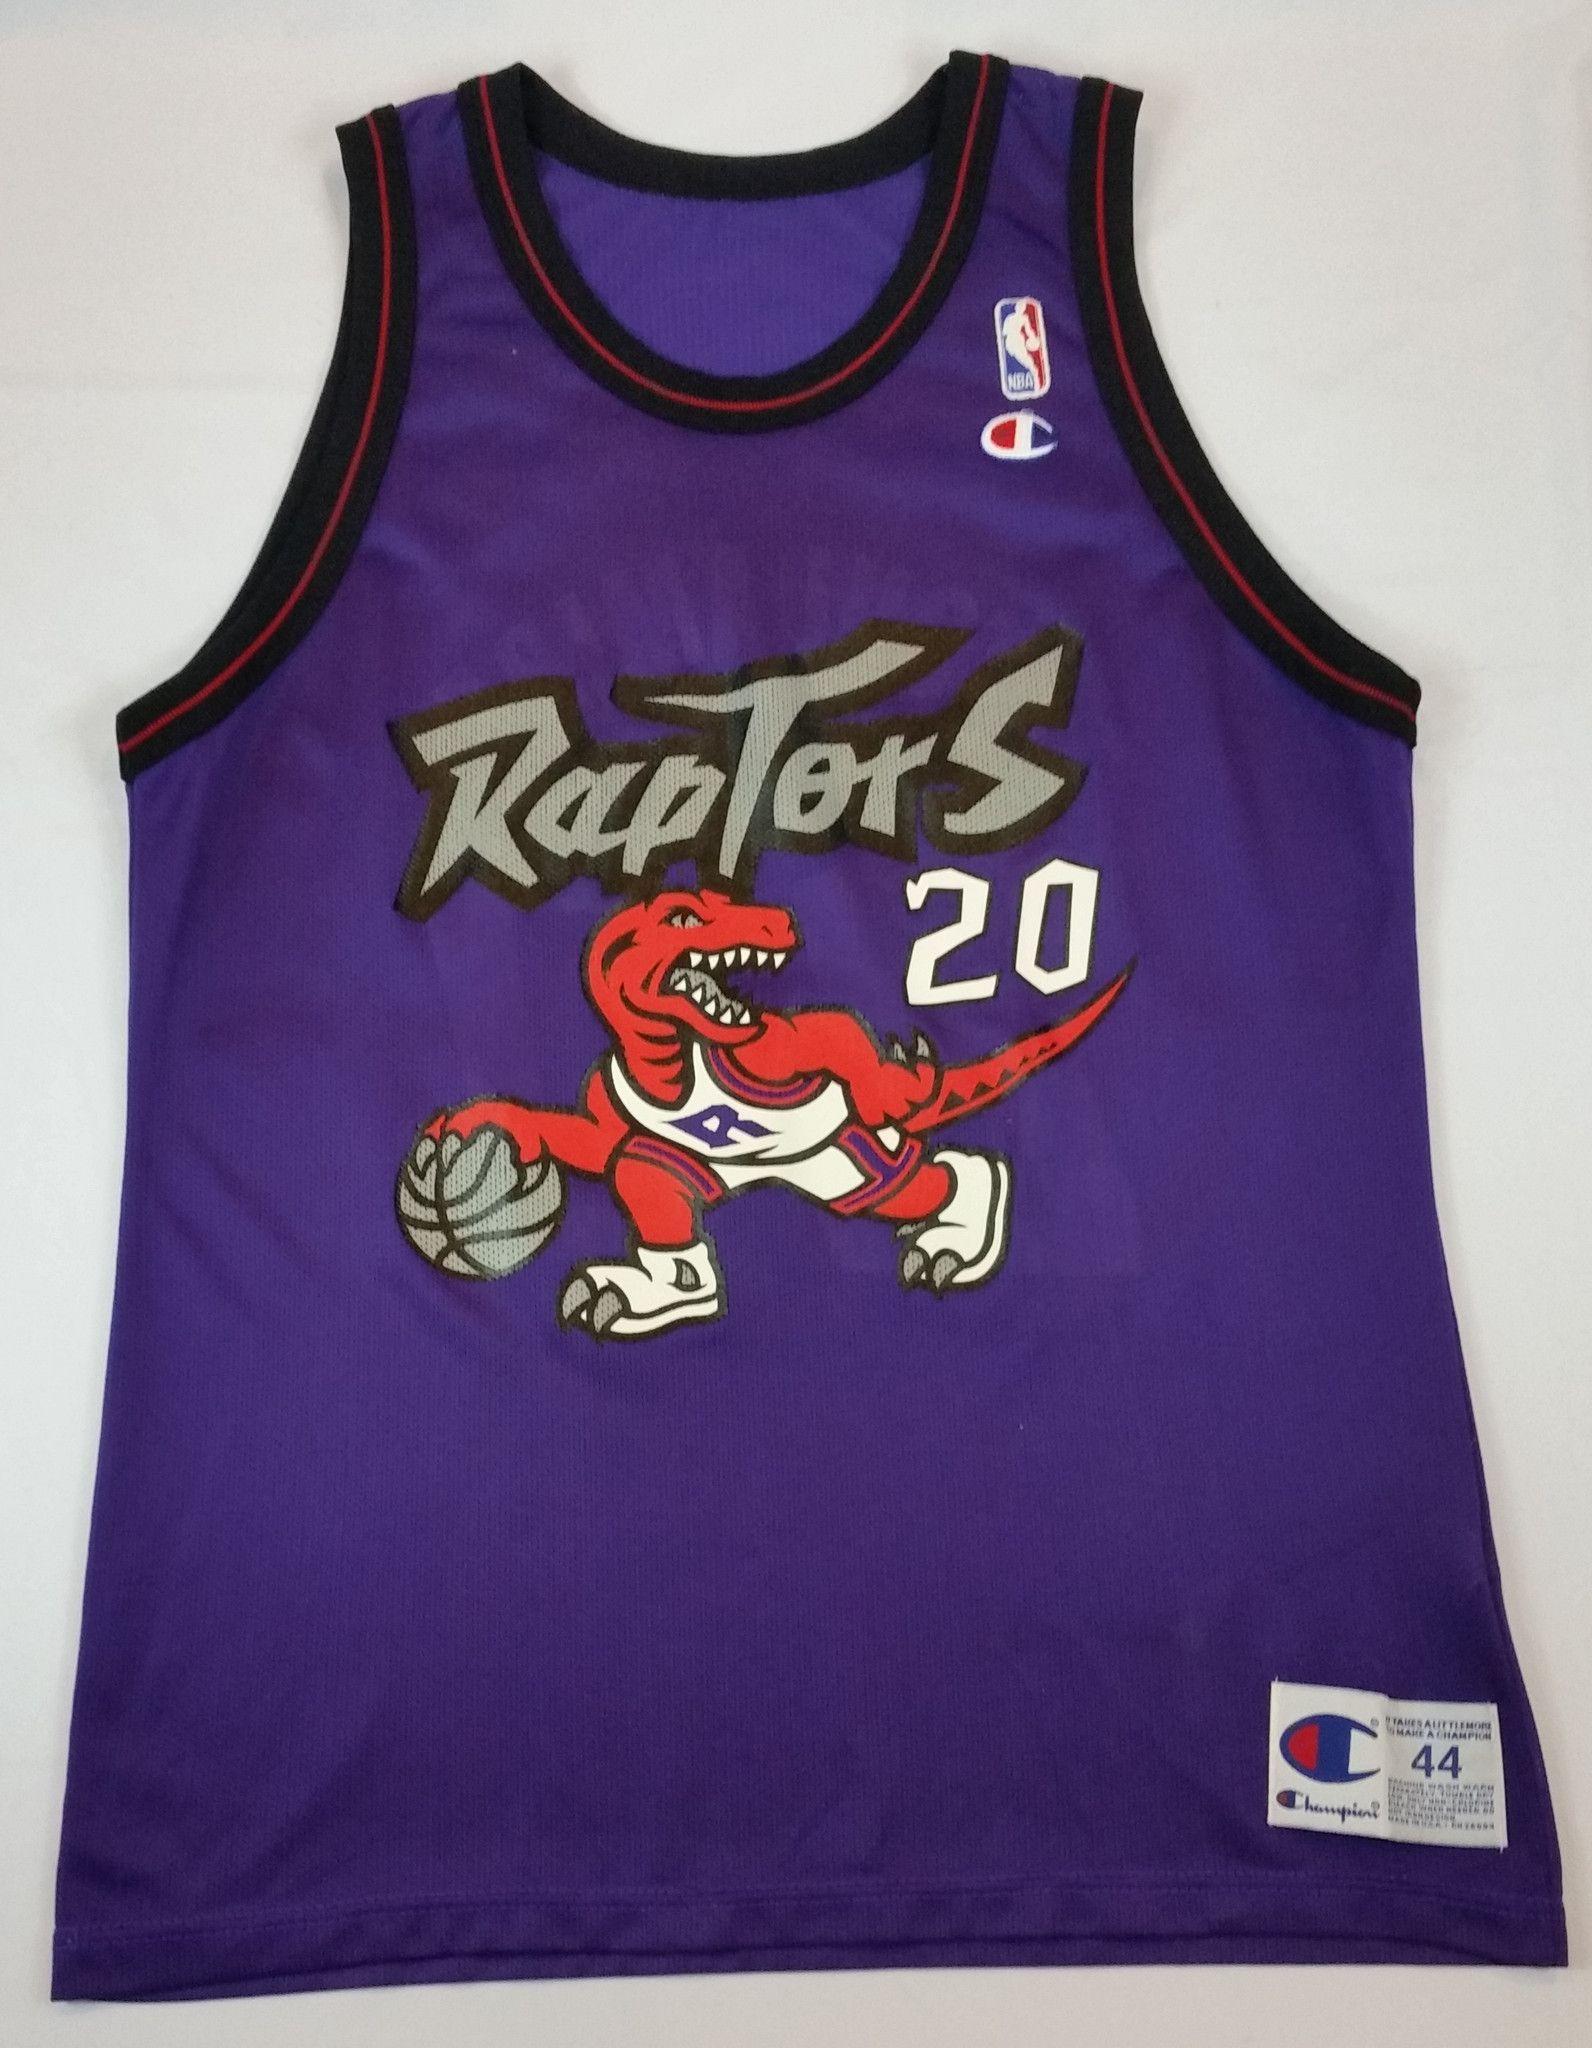 bacb75c3cb1 Damon Stoudamire #20 Champion Jersey Vintage Toronto Raptors NBA Rare Mens  44